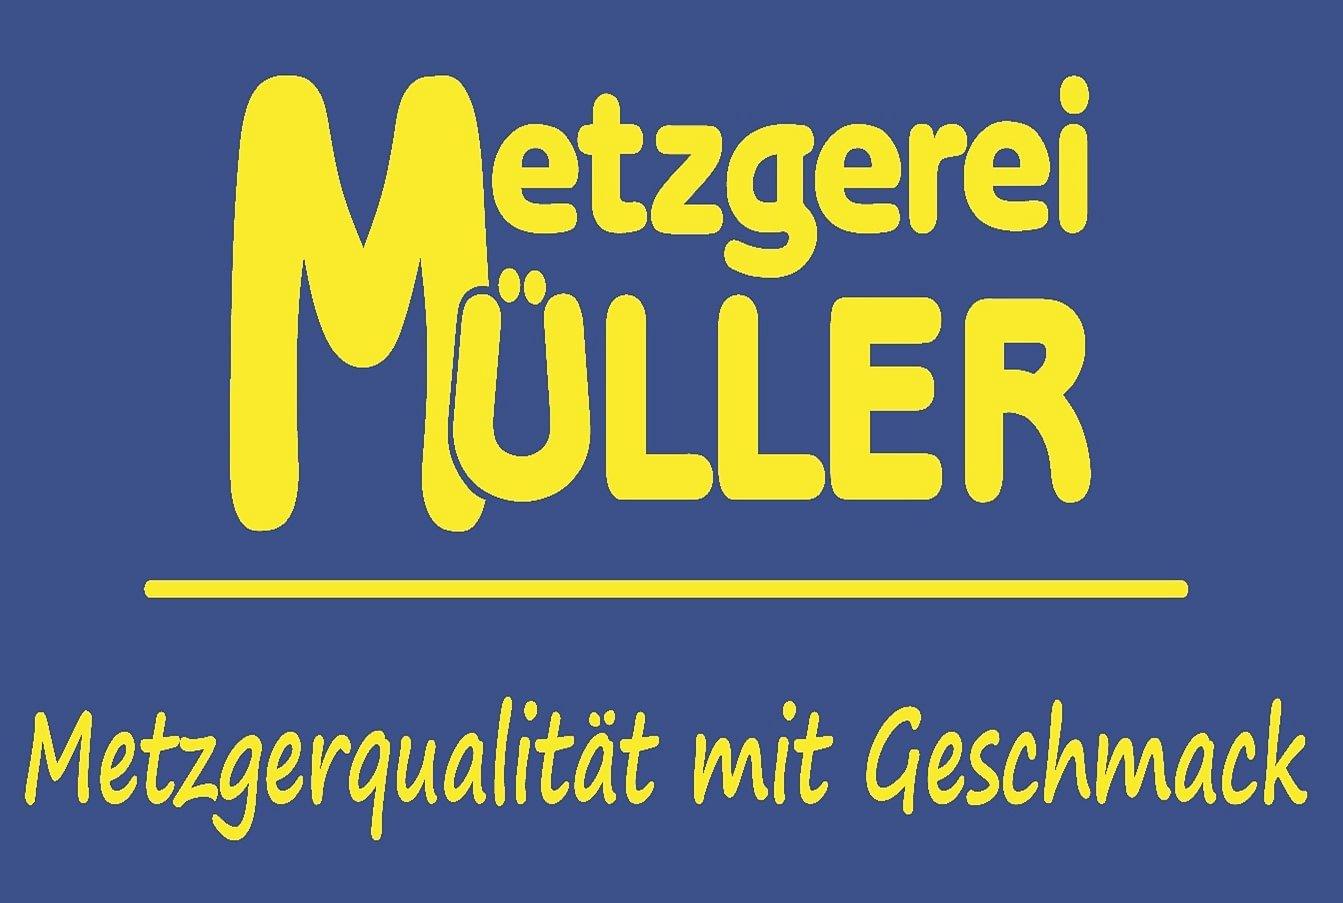 Metzgerei Müller Thun AG